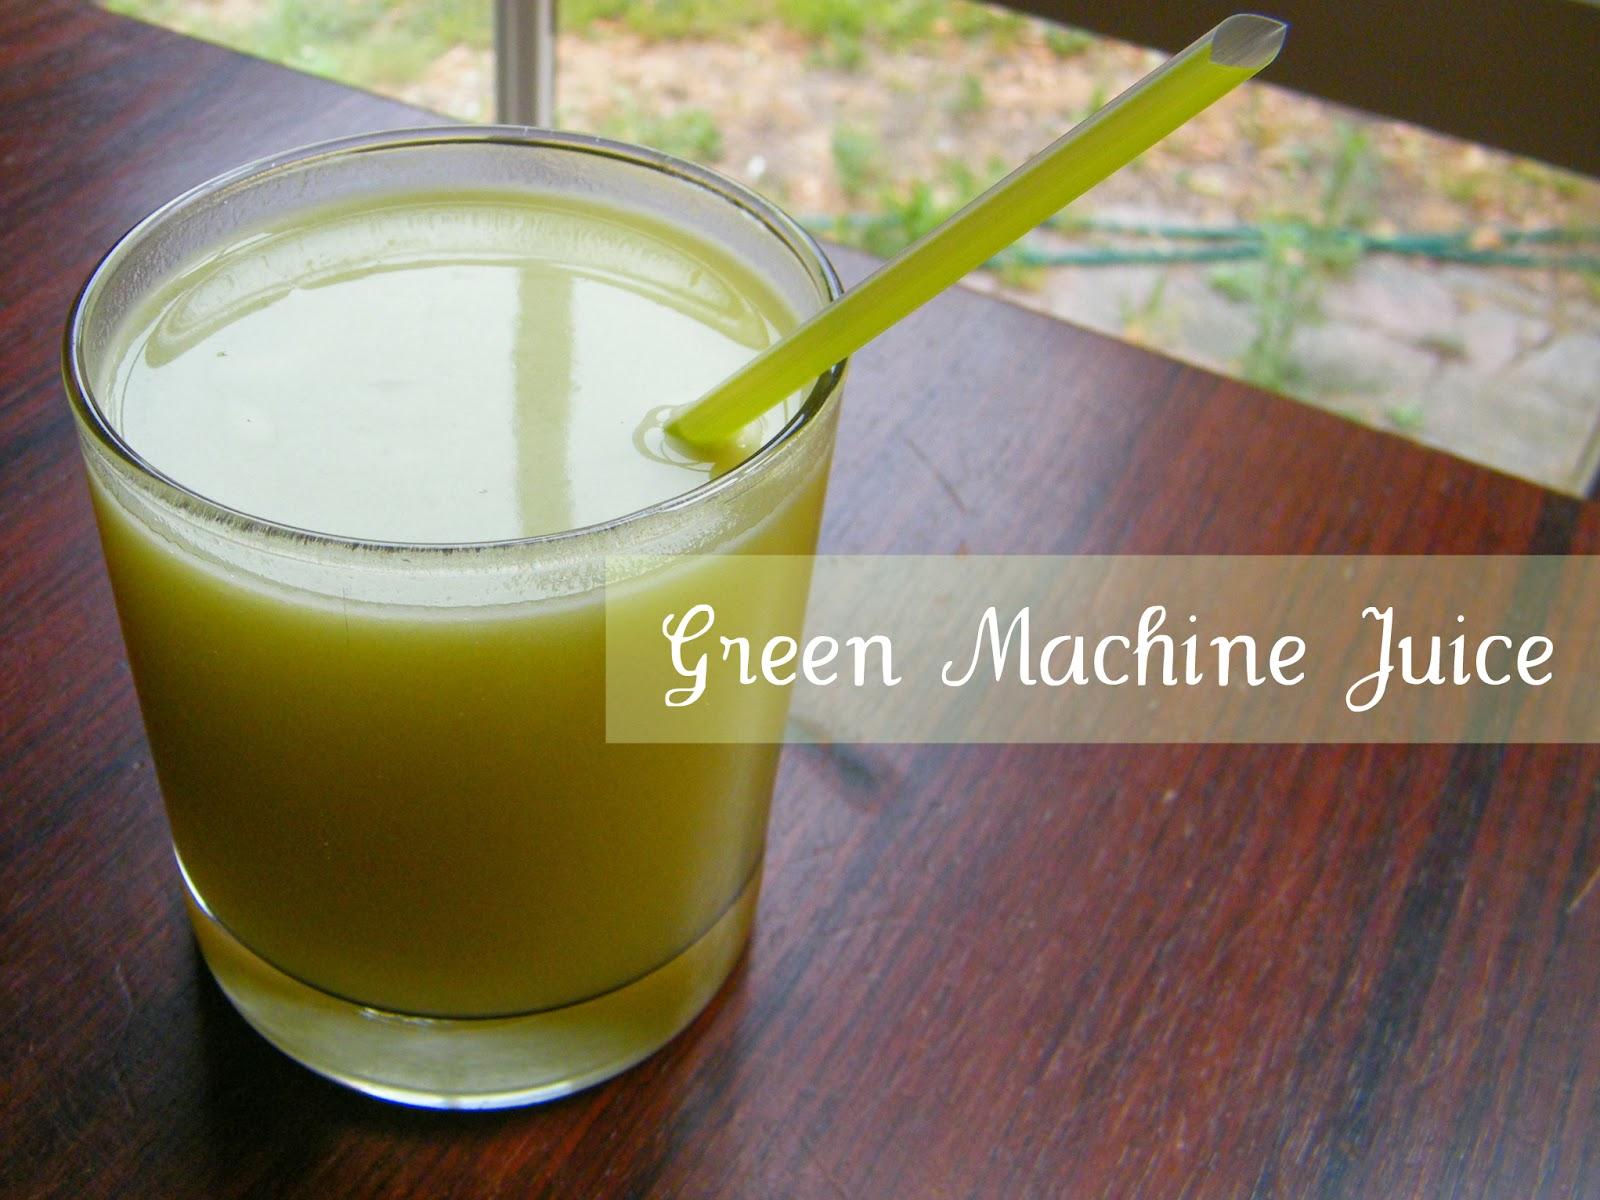 green machine juice review